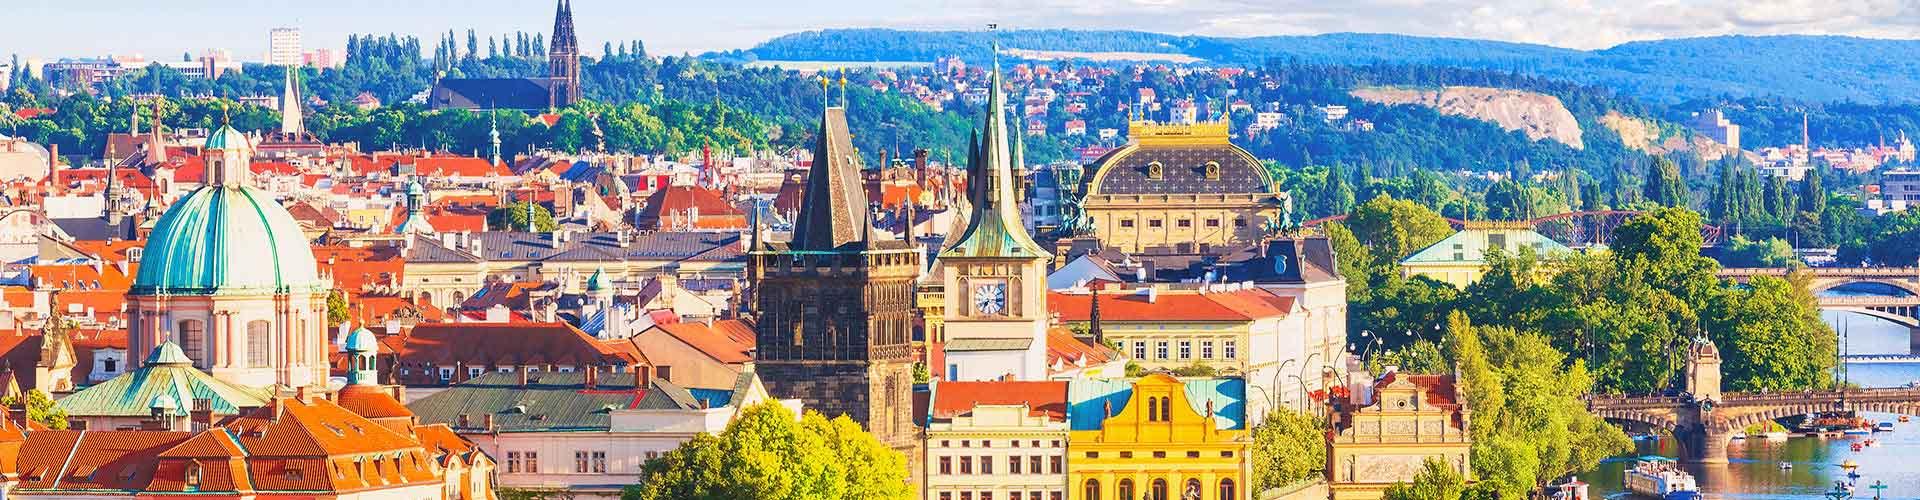 Praha - Hostelů v Praha. Mapy pro Praha, fotky a recenze pro každý hostel v Praha.